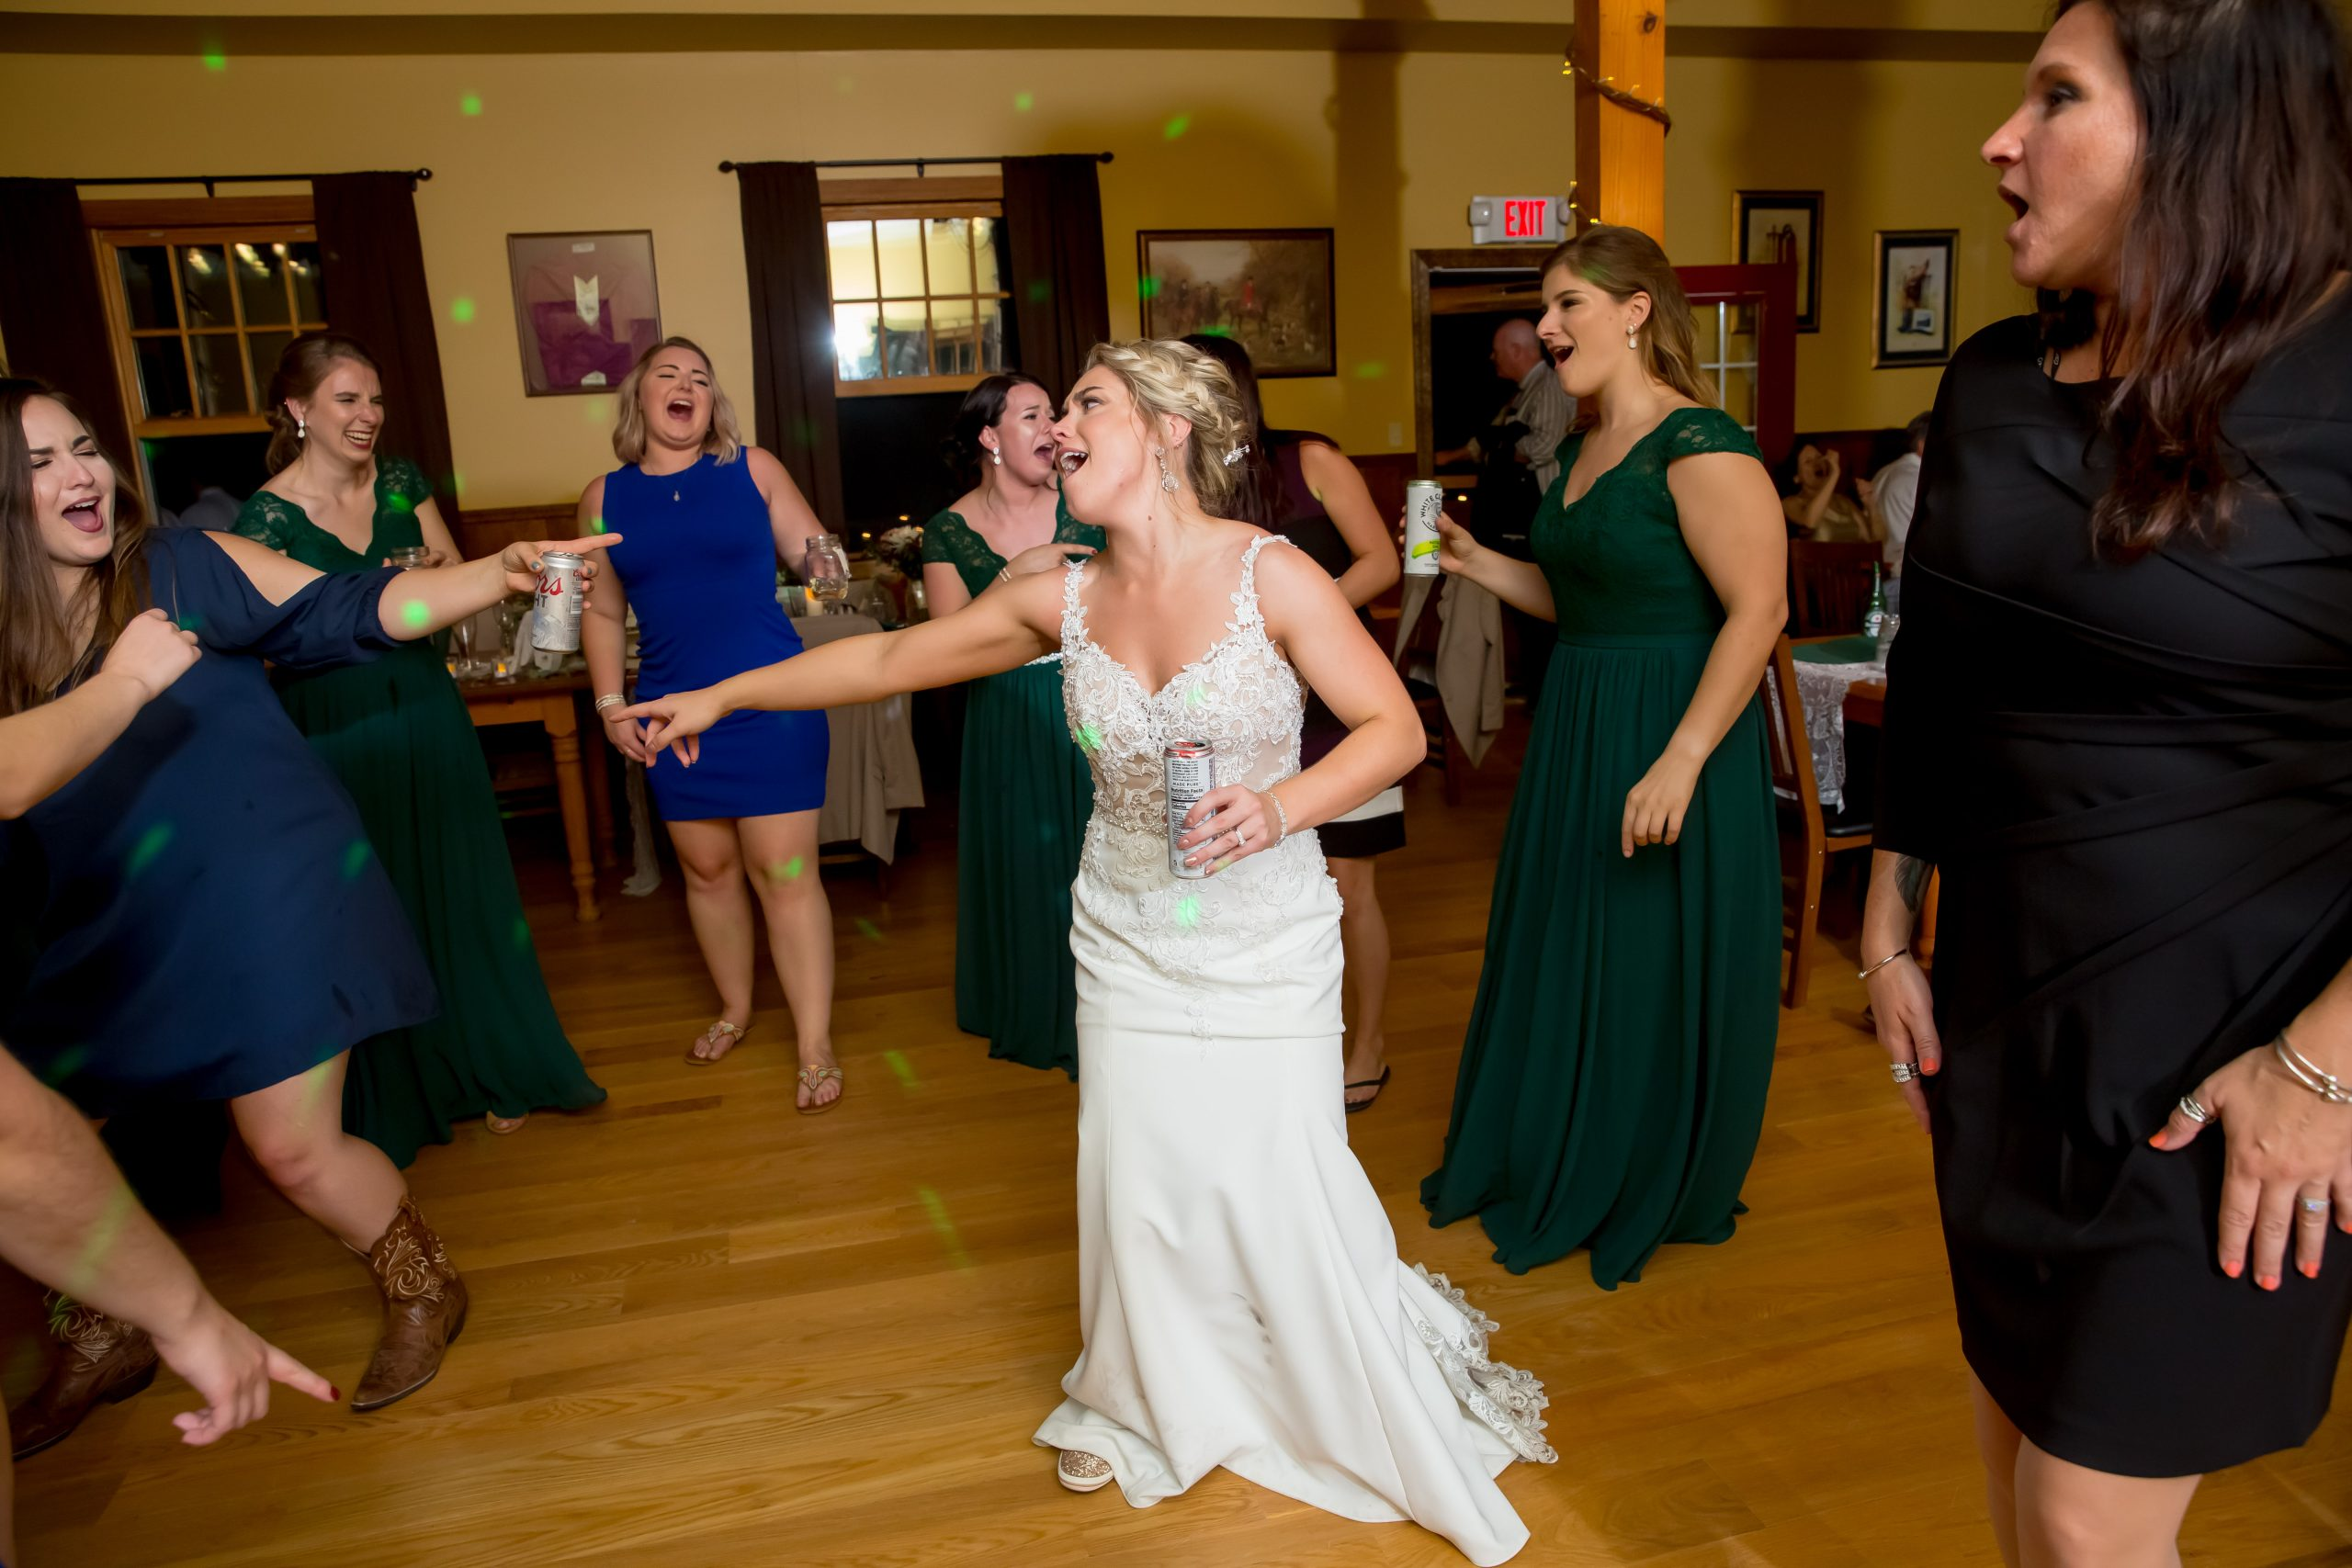 liberty_ridge_wedding58.jpg